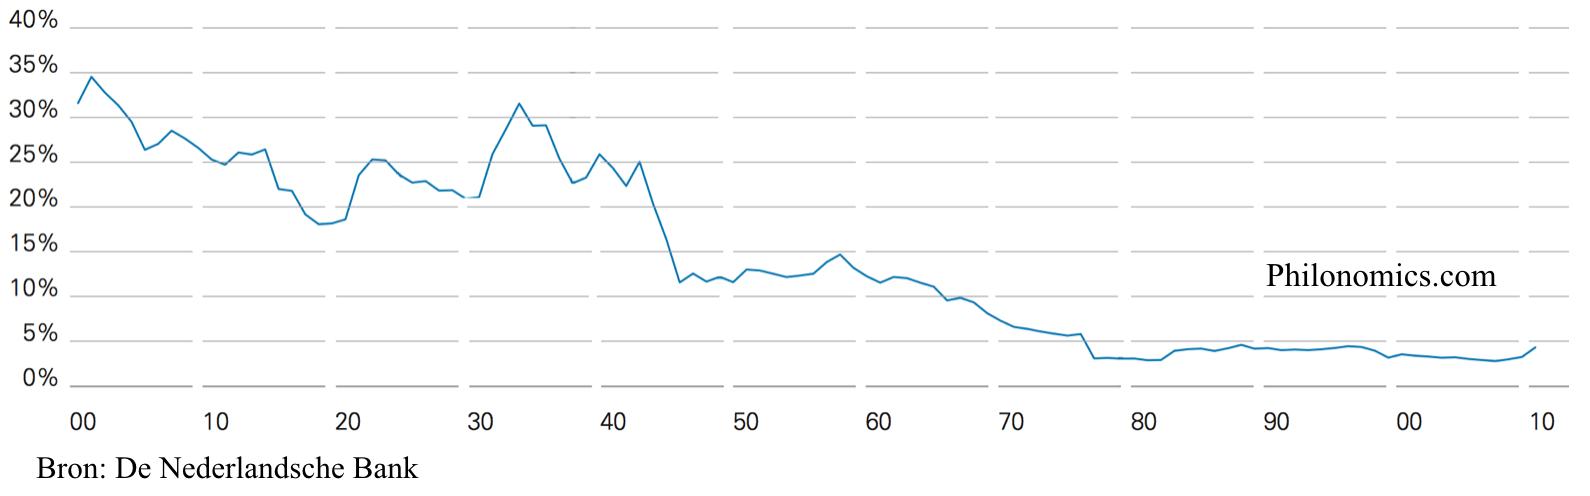 Leverage Ratio Nederlandse Banken 1900-2010